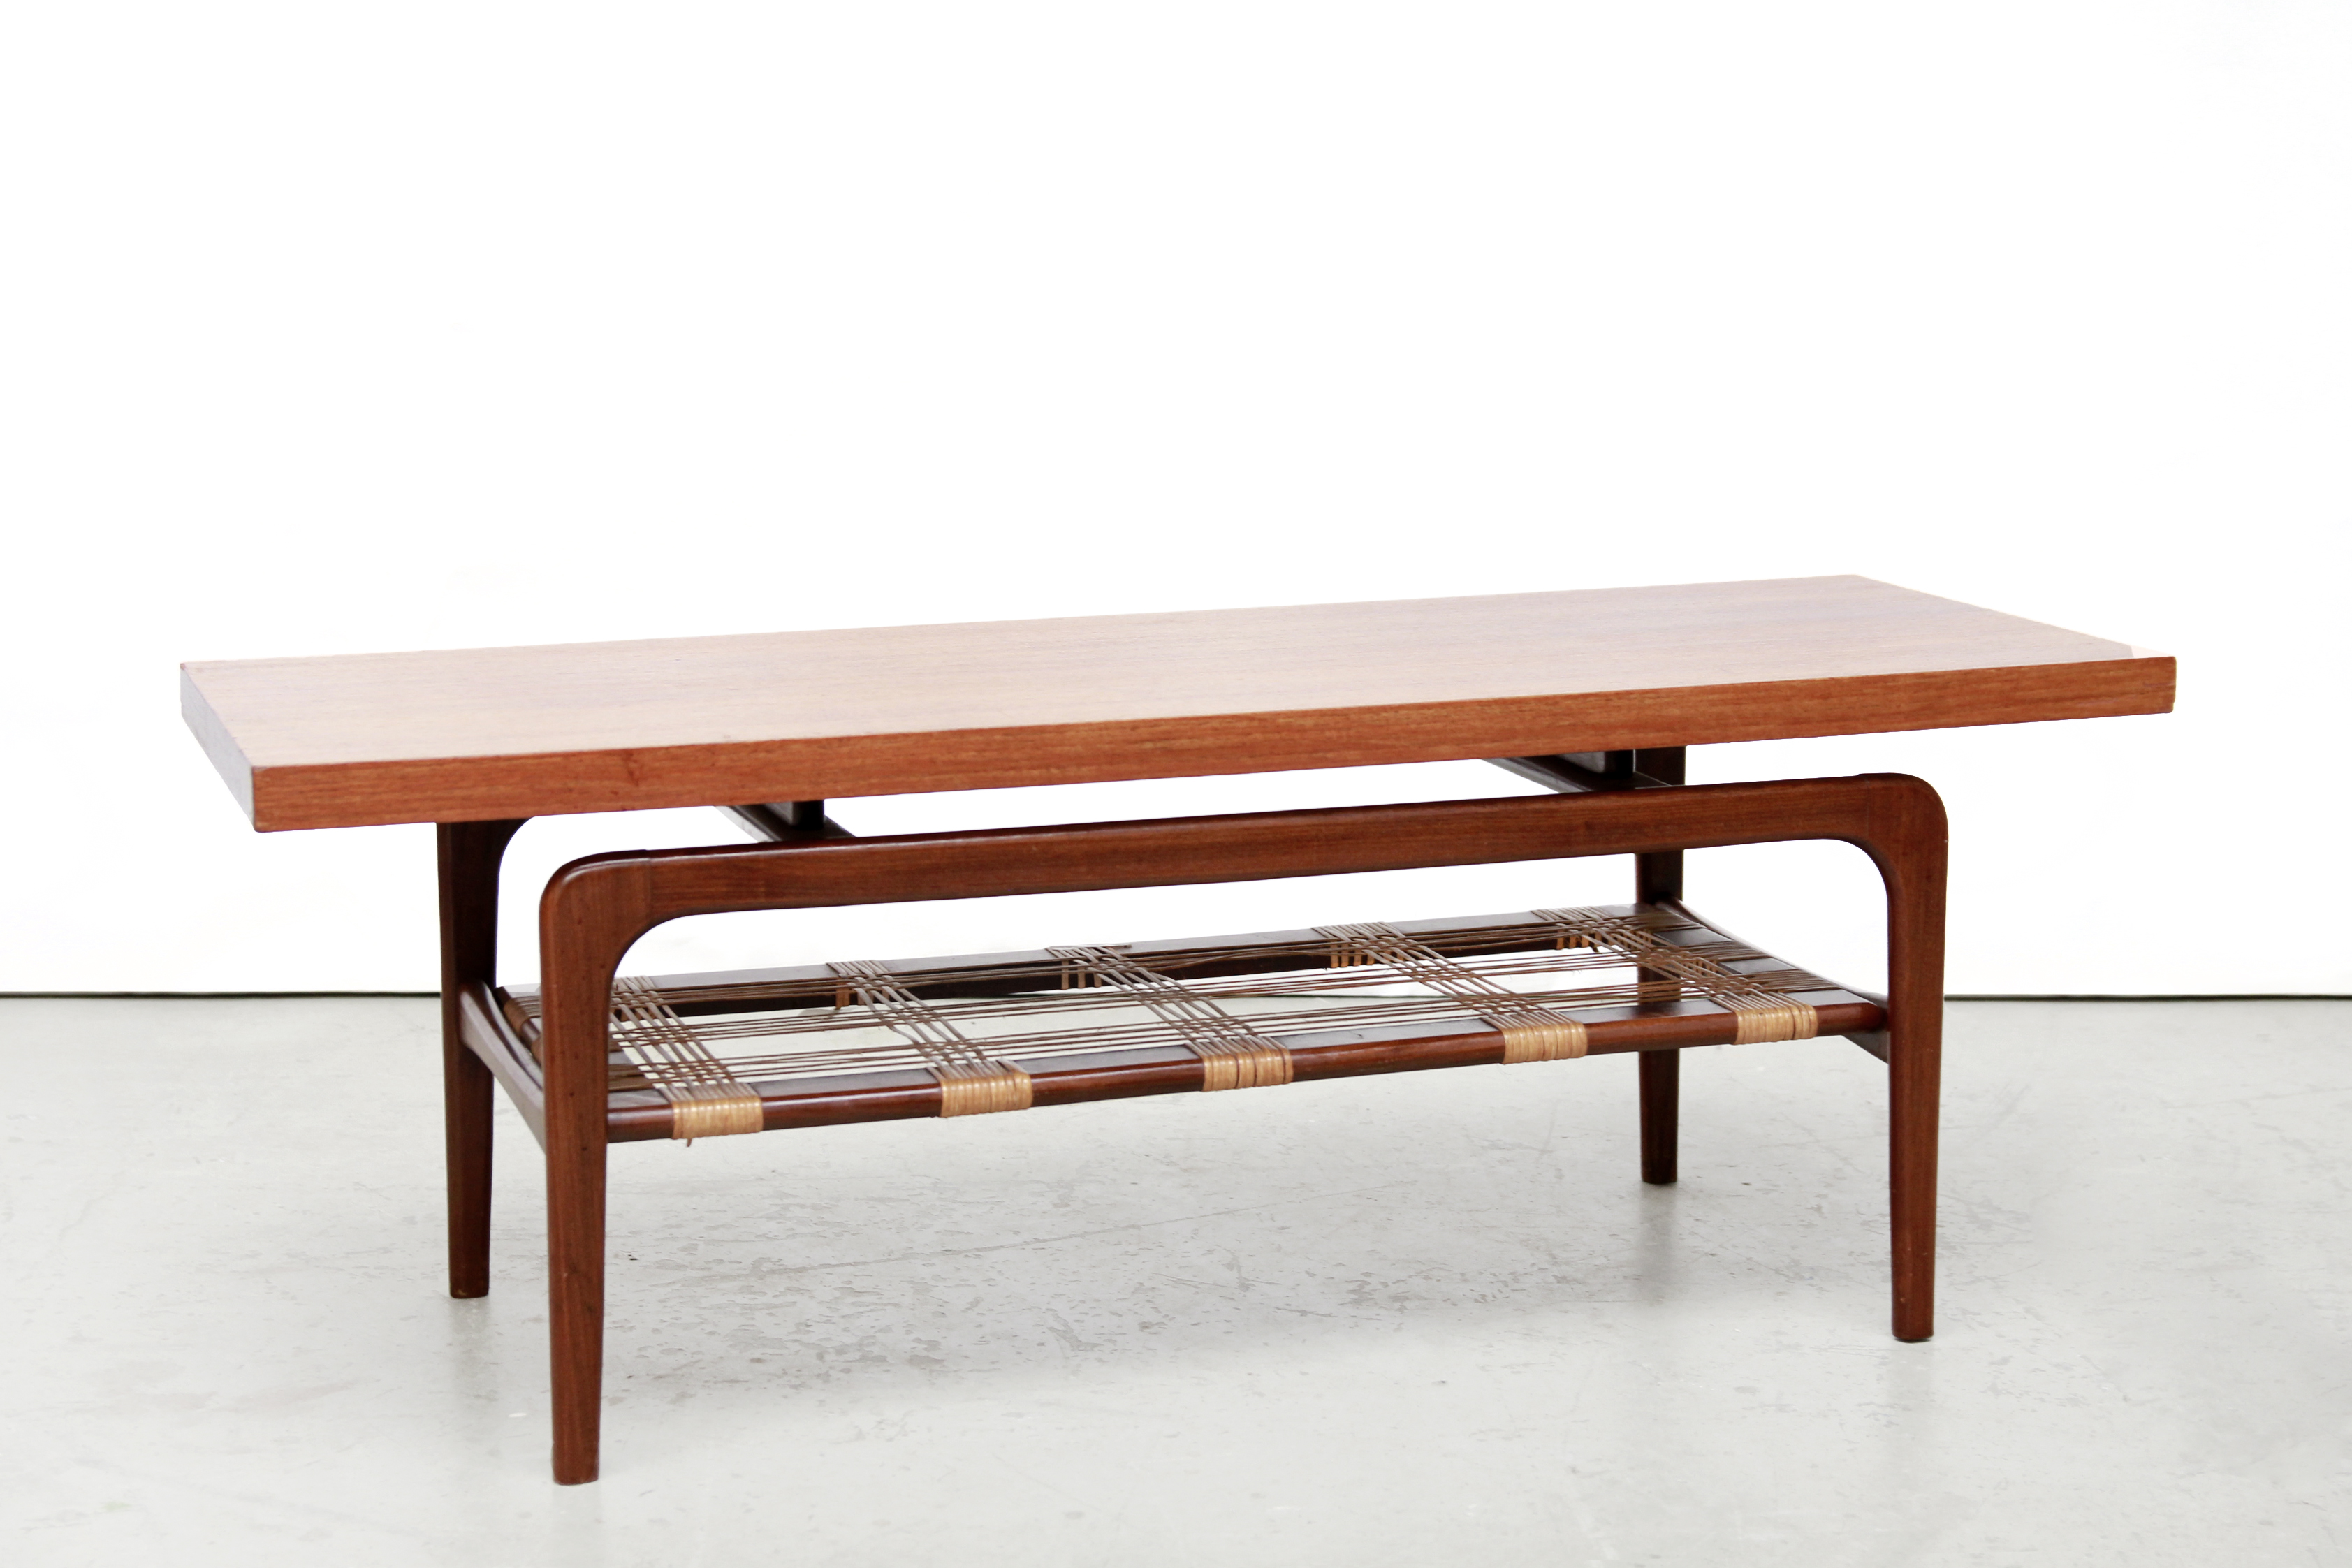 Teakhouten webe salontafel van ons vintage design meubels amsterdam